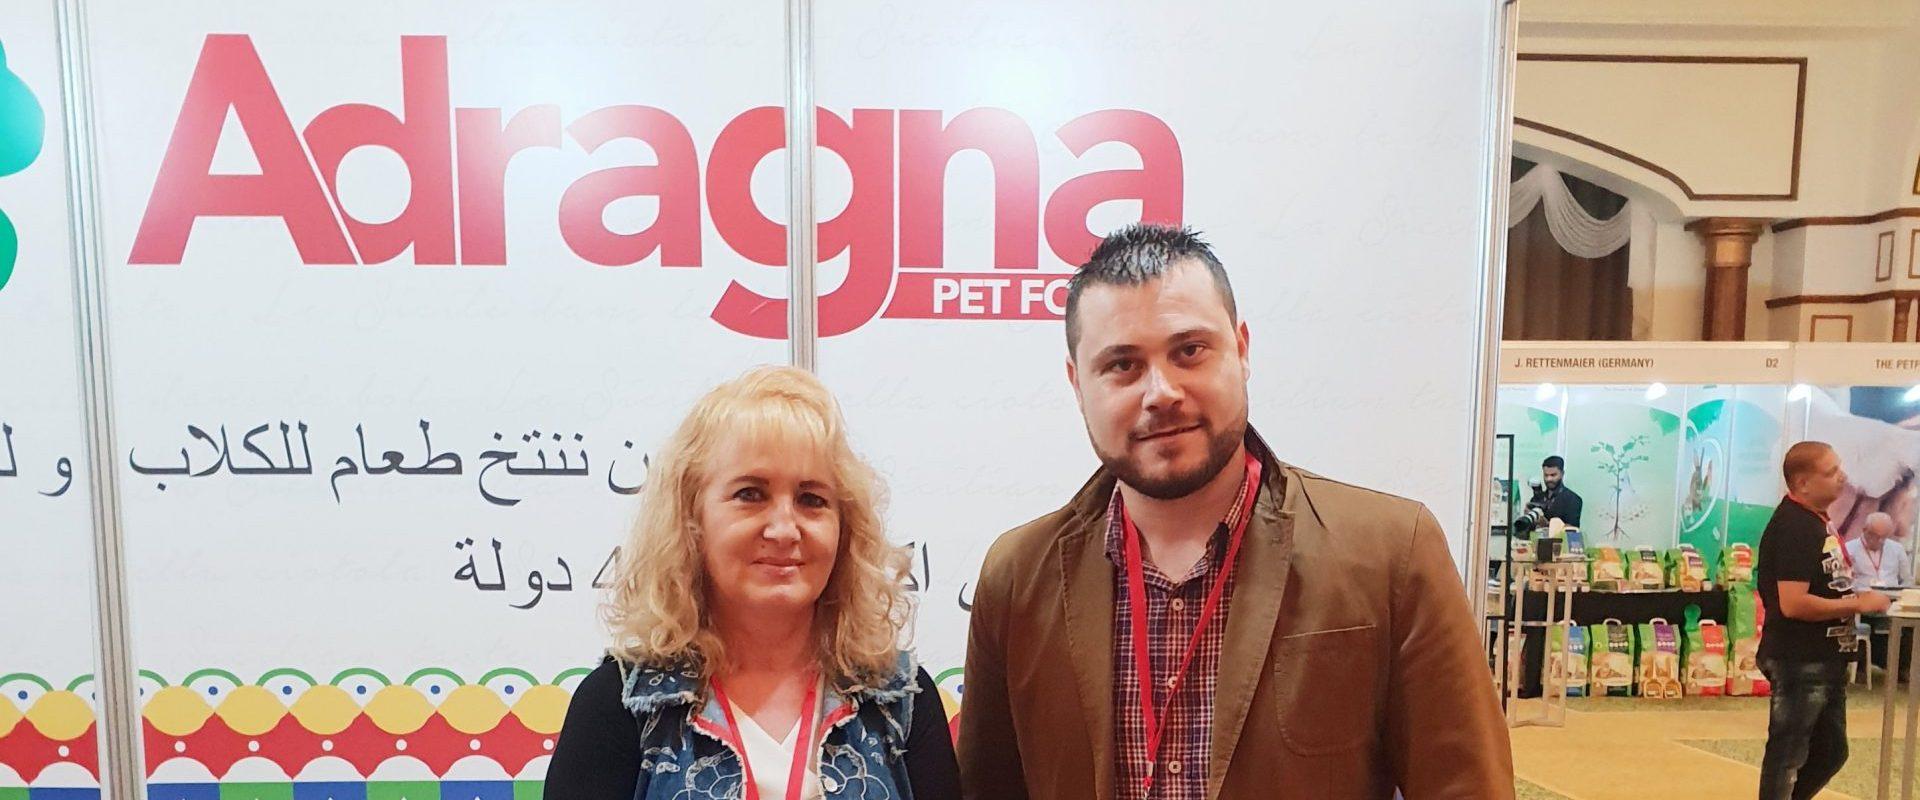 Pets Arabia 2019